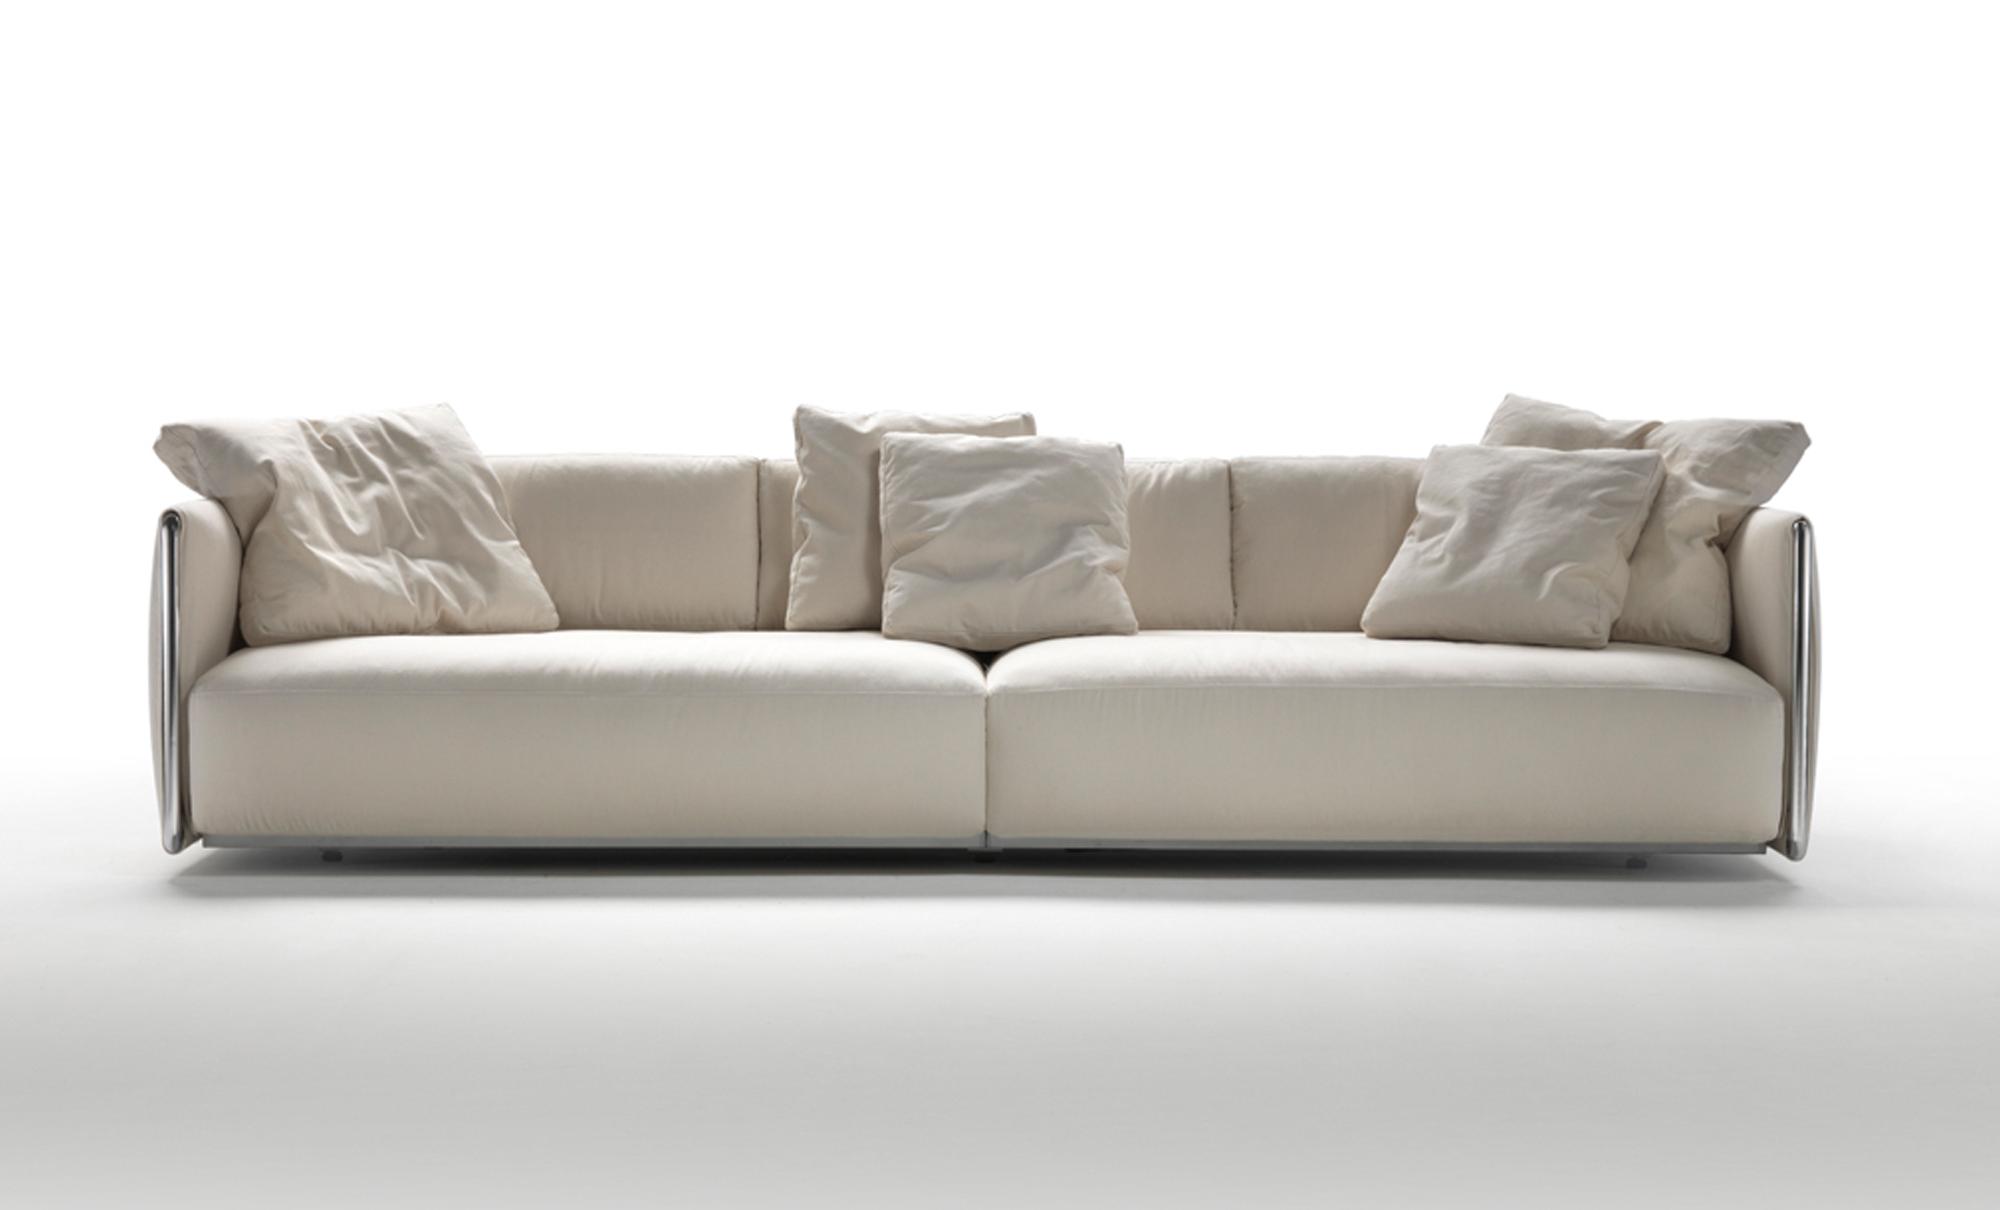 sofas couches 4 less concord ca edmond fanuli furniture